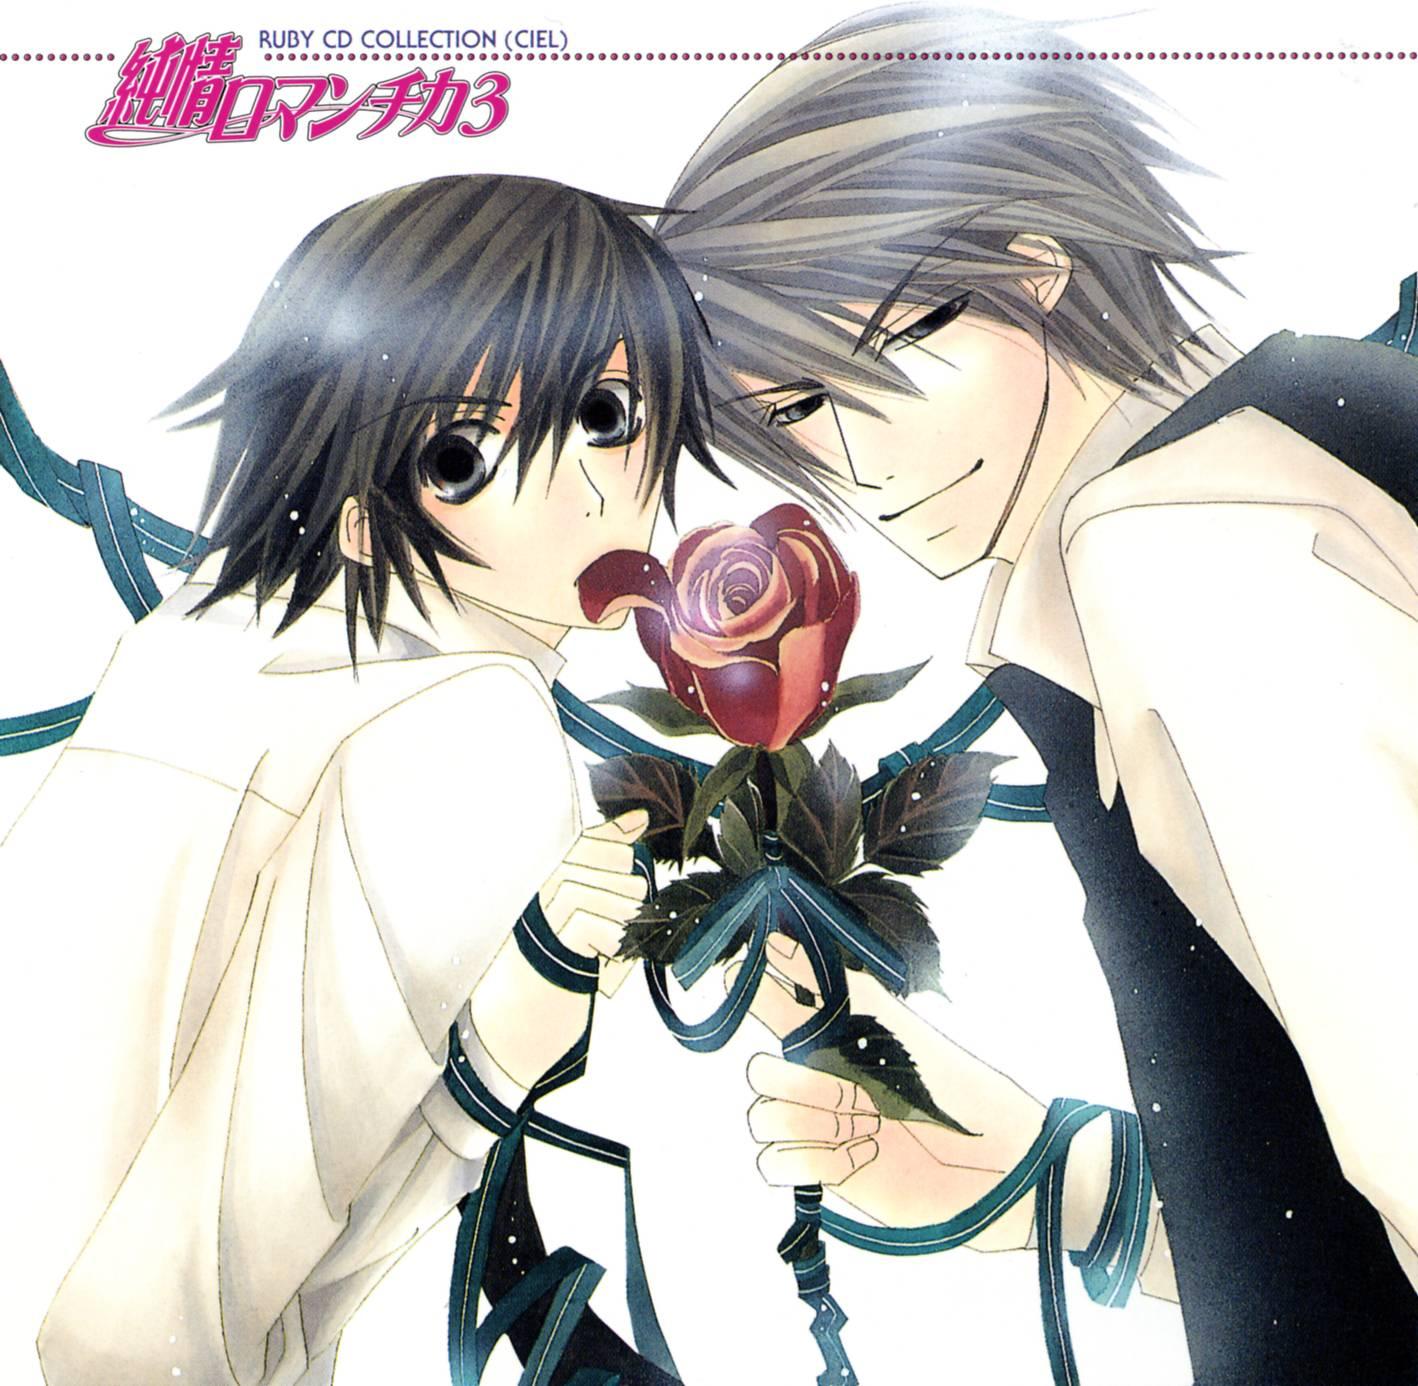 Junjou Romantica: Tied Together By Love - Minitokyo